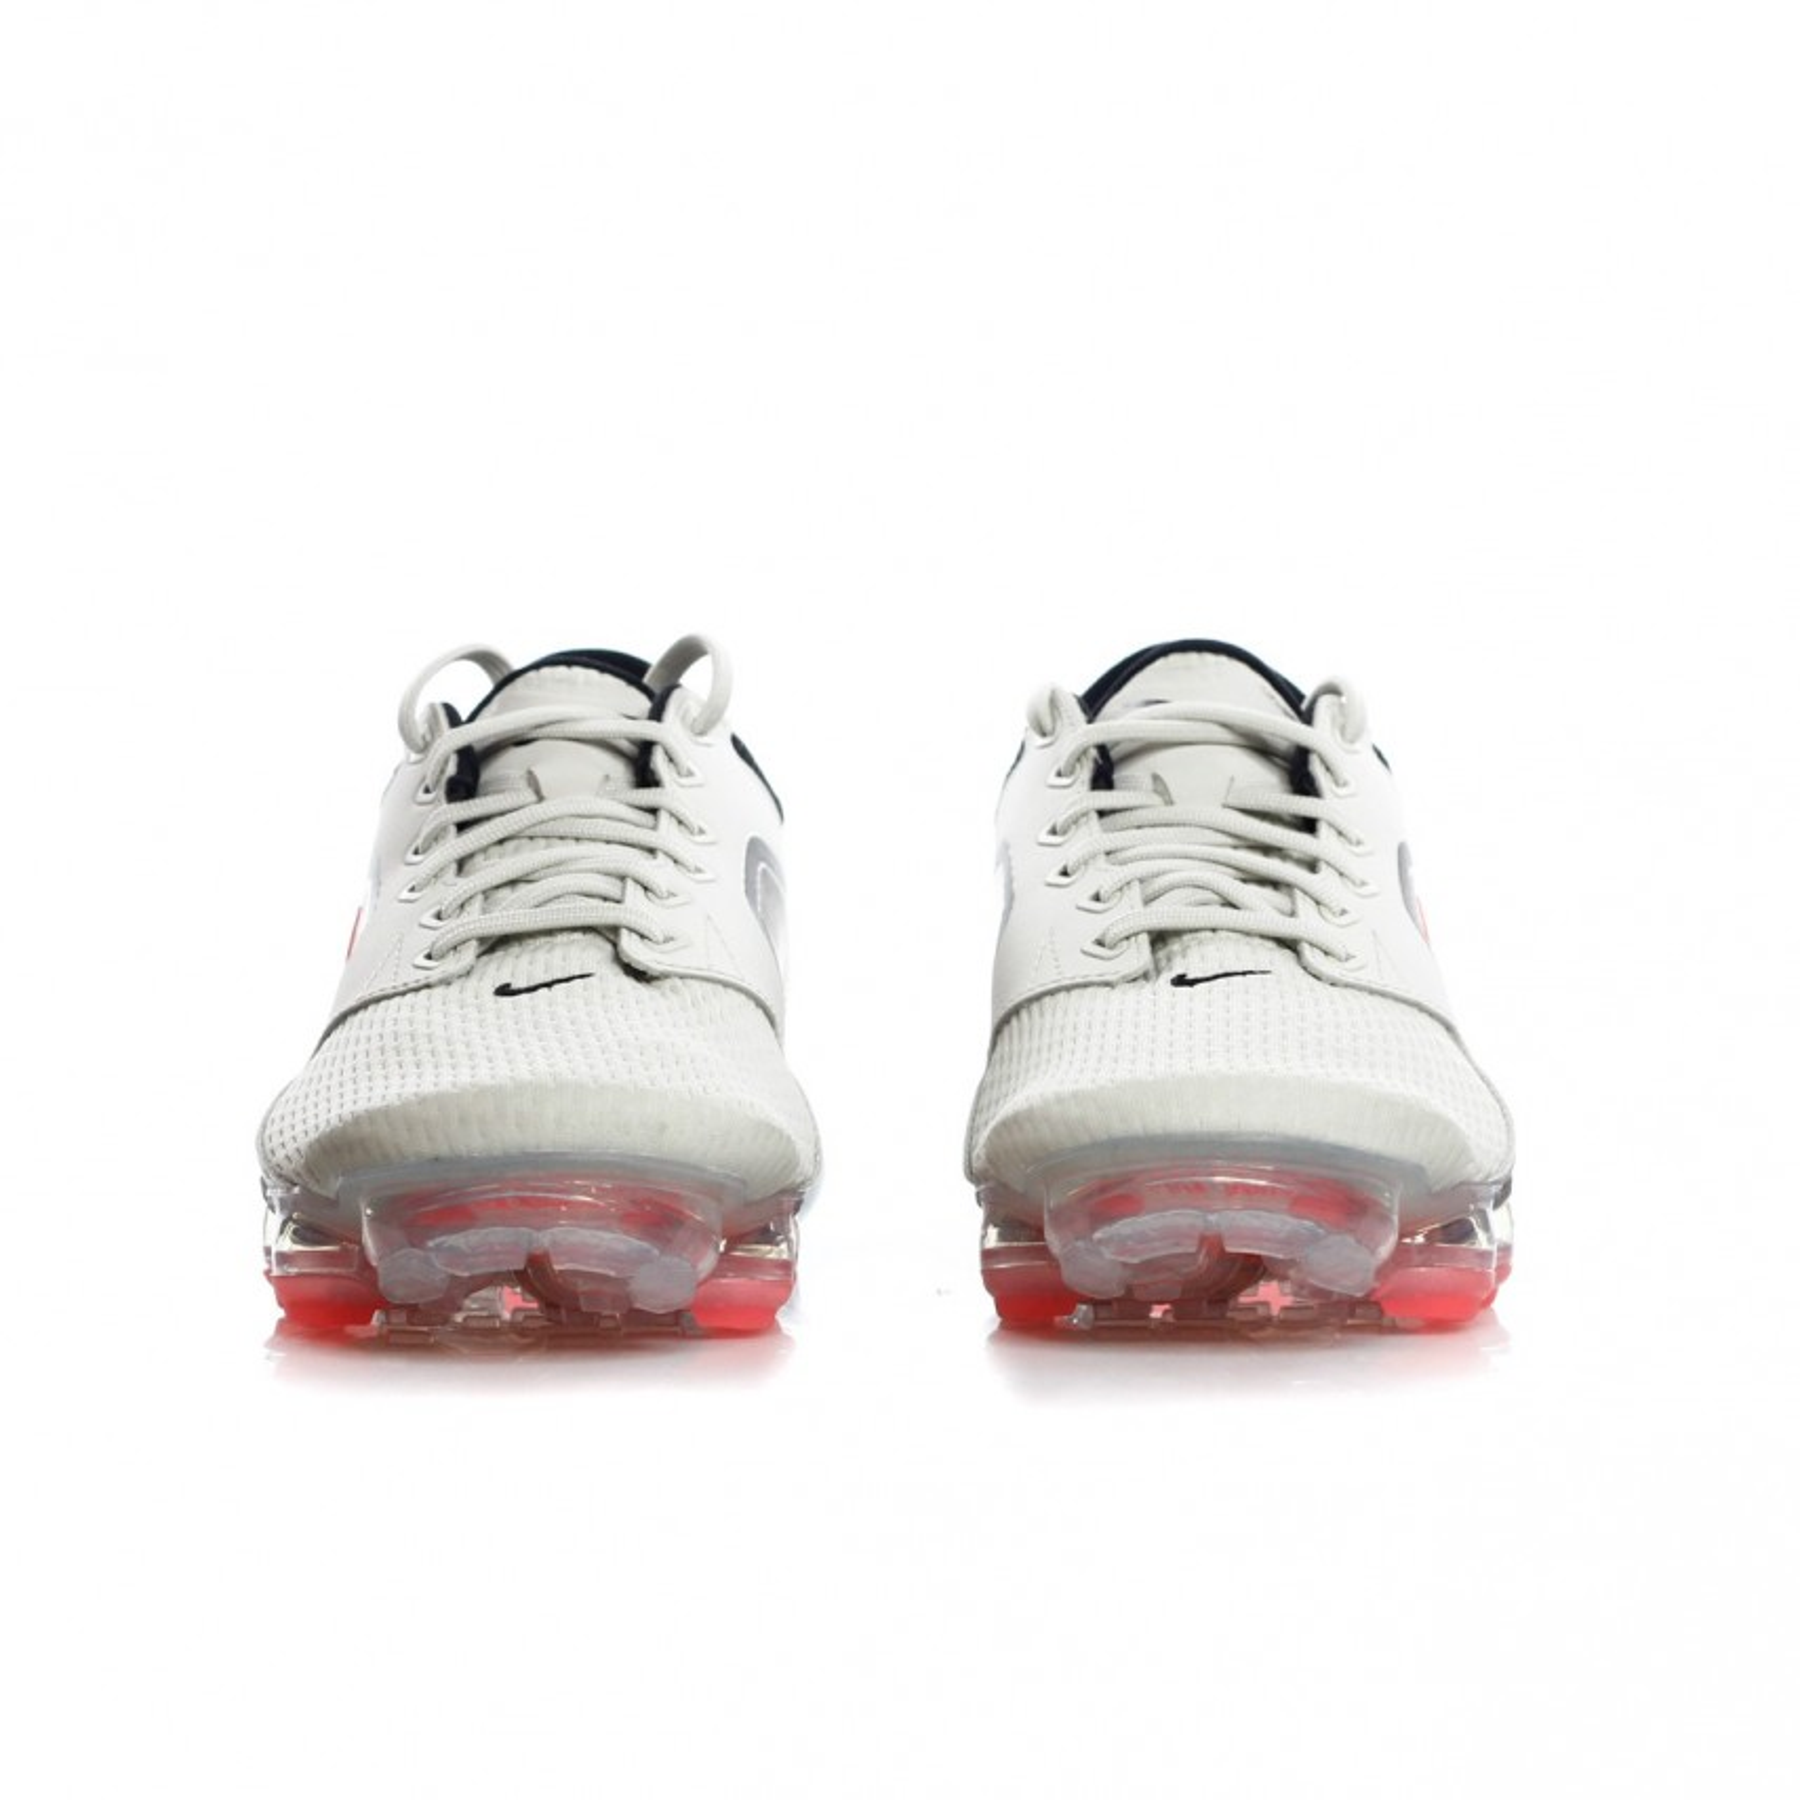 NIKE SCARPA BASSA AIR VAPORMAX LIGHT BONEHOT PUNCH Sneakers  B